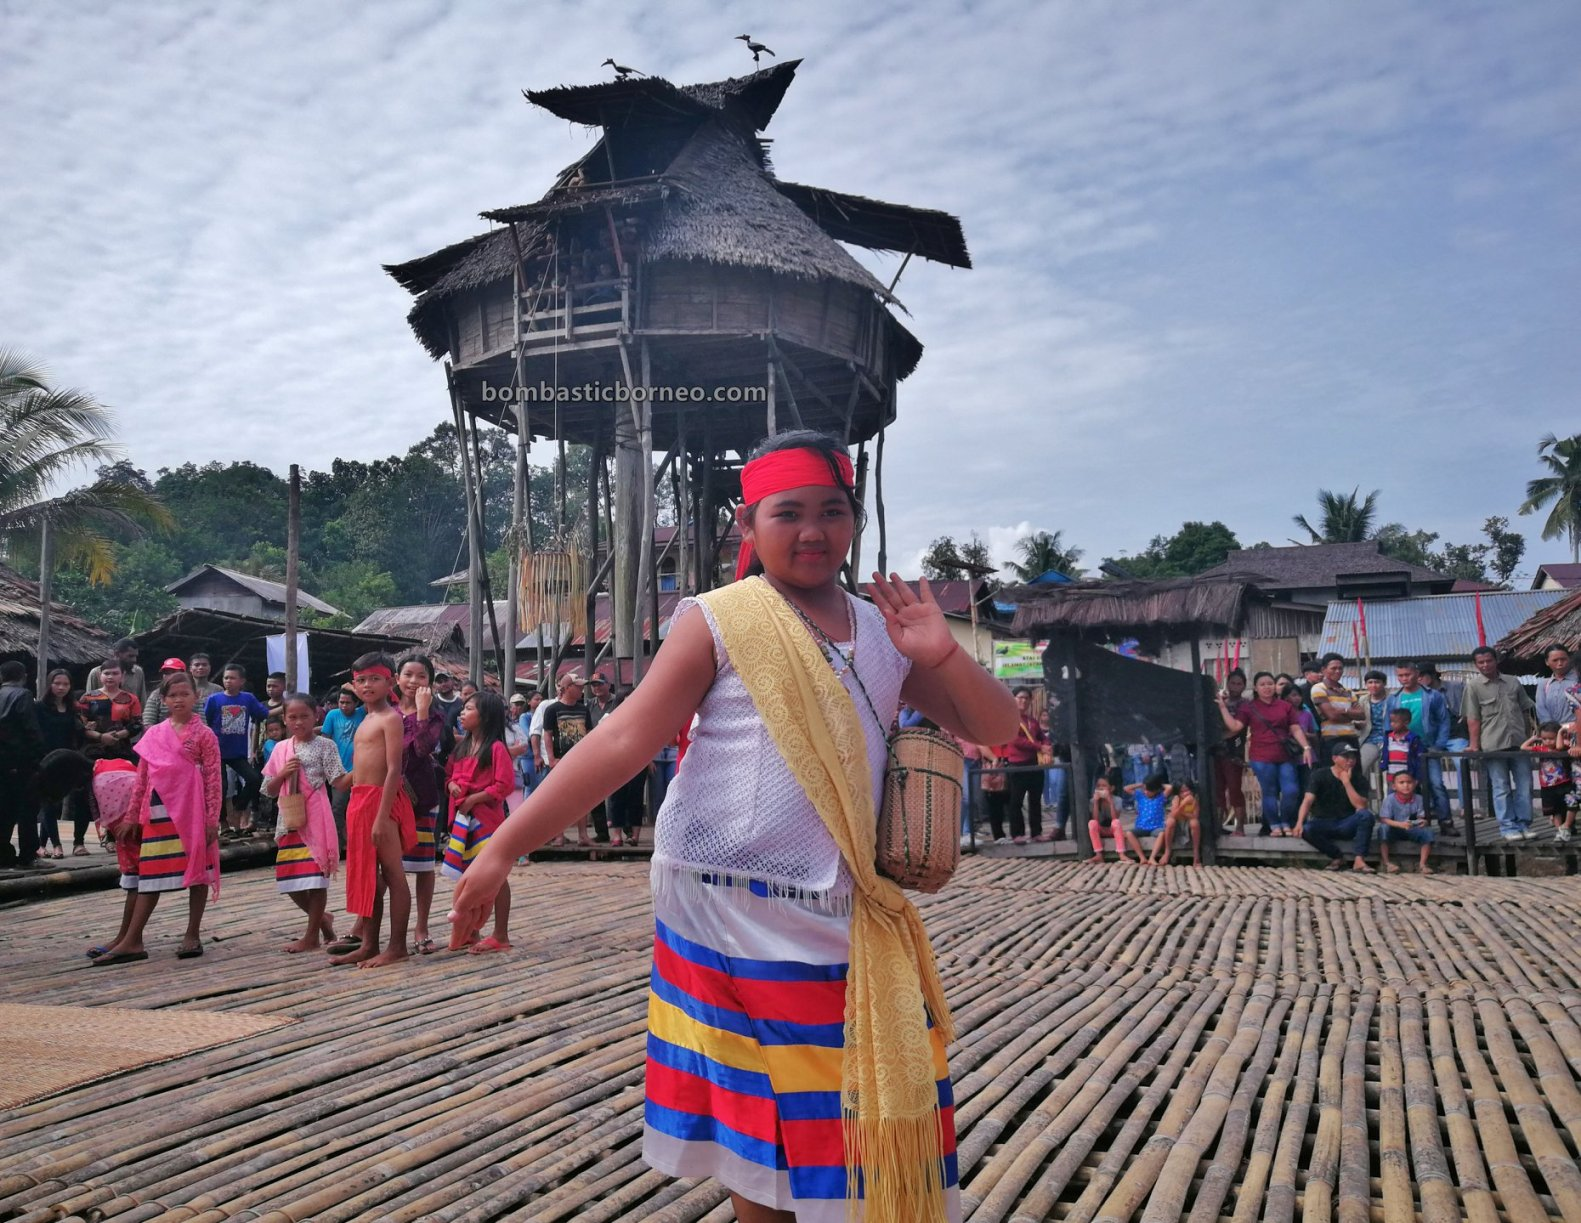 Nyobeng Sebujit, Gawai Dayak, Paddy Harvest Festival, village, Destination, event, Indonesia, Kalimantan Barat, Desa Hli Buei, Indigenous, tribe, Rumah Adat Baluk, skull house, Tourism, travel guide, Borneo